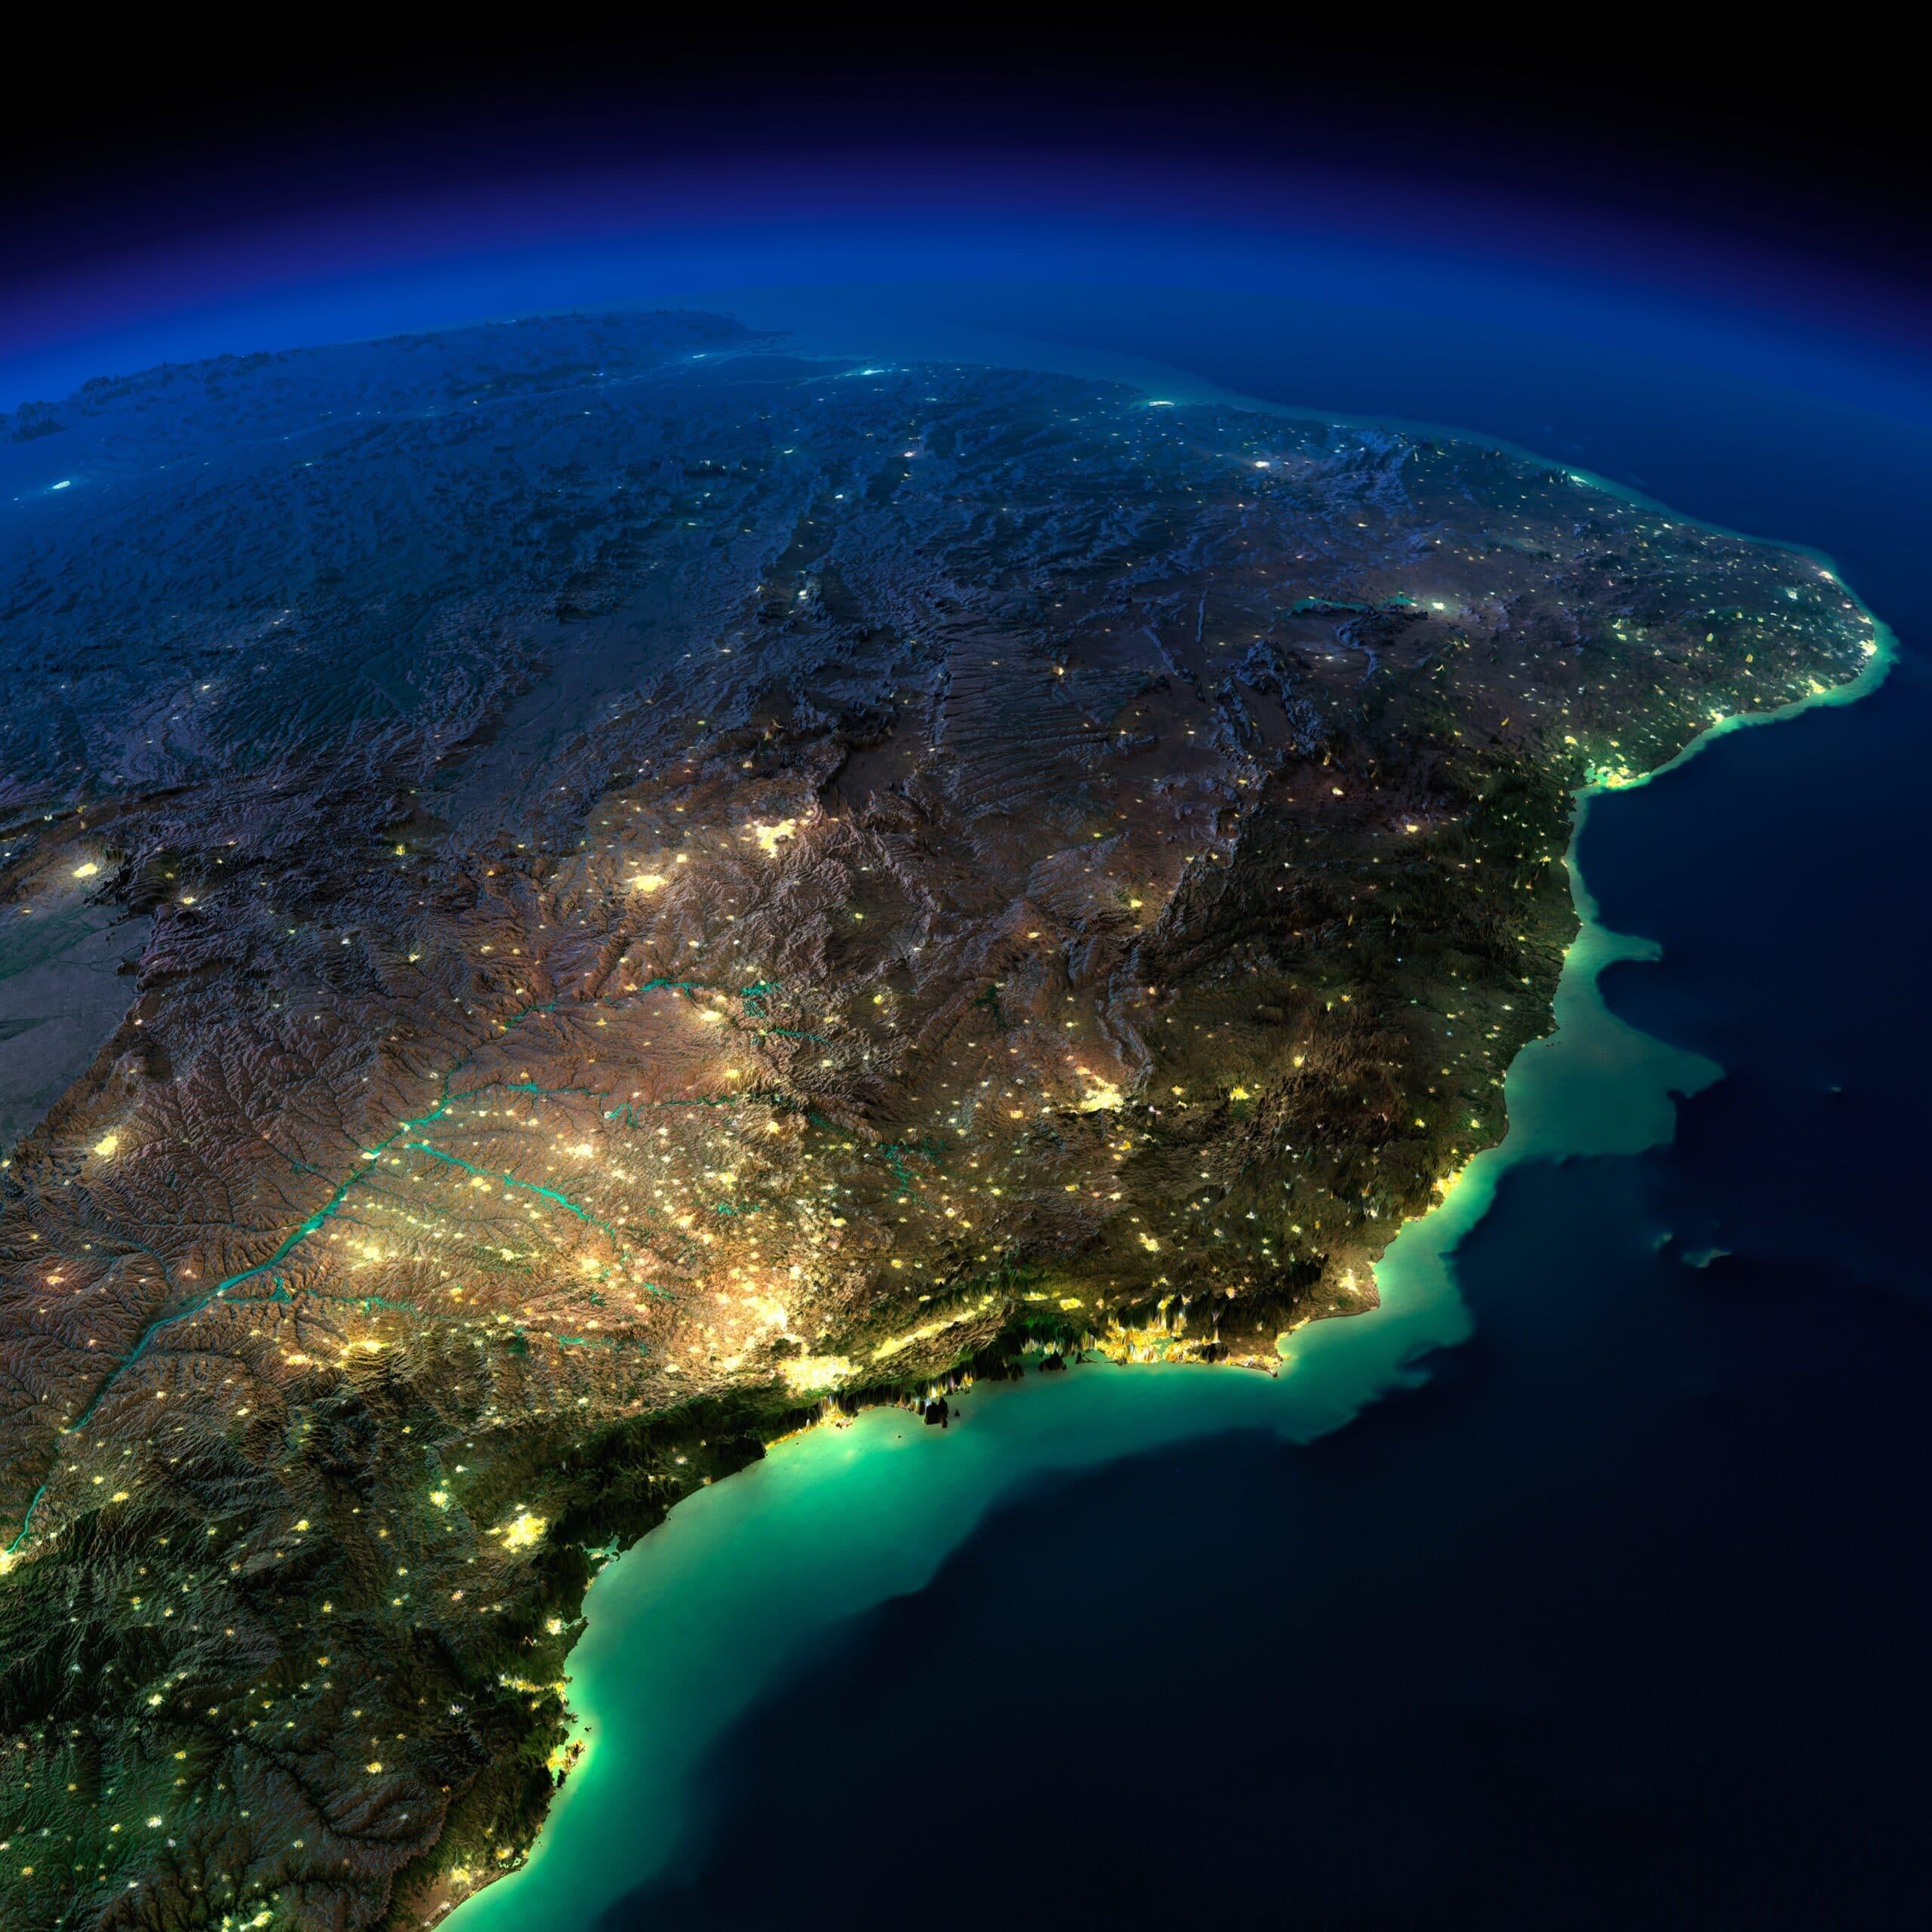 Brasil visto do espaço (planeta Terra)